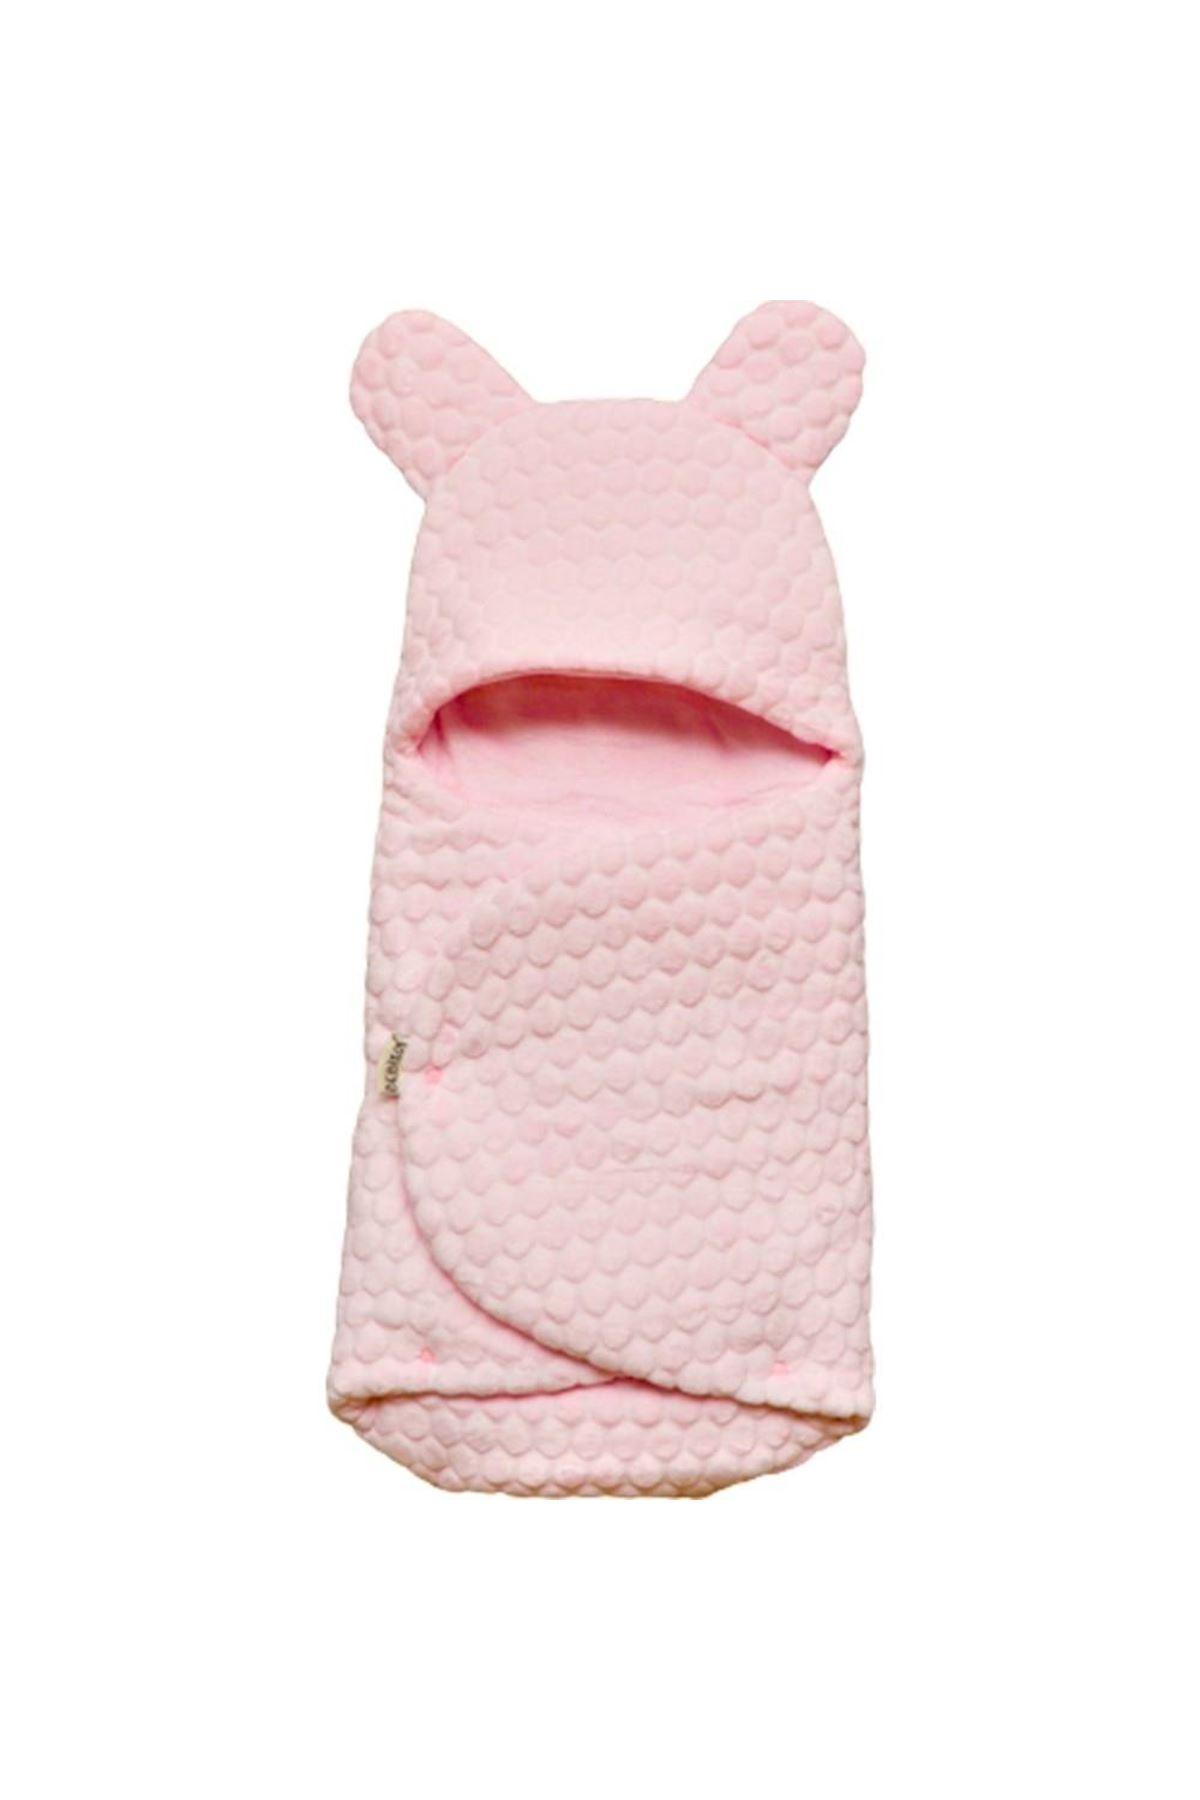 Bebitof Baby Kabartmalı Velboa Kundak 95025 Pembe